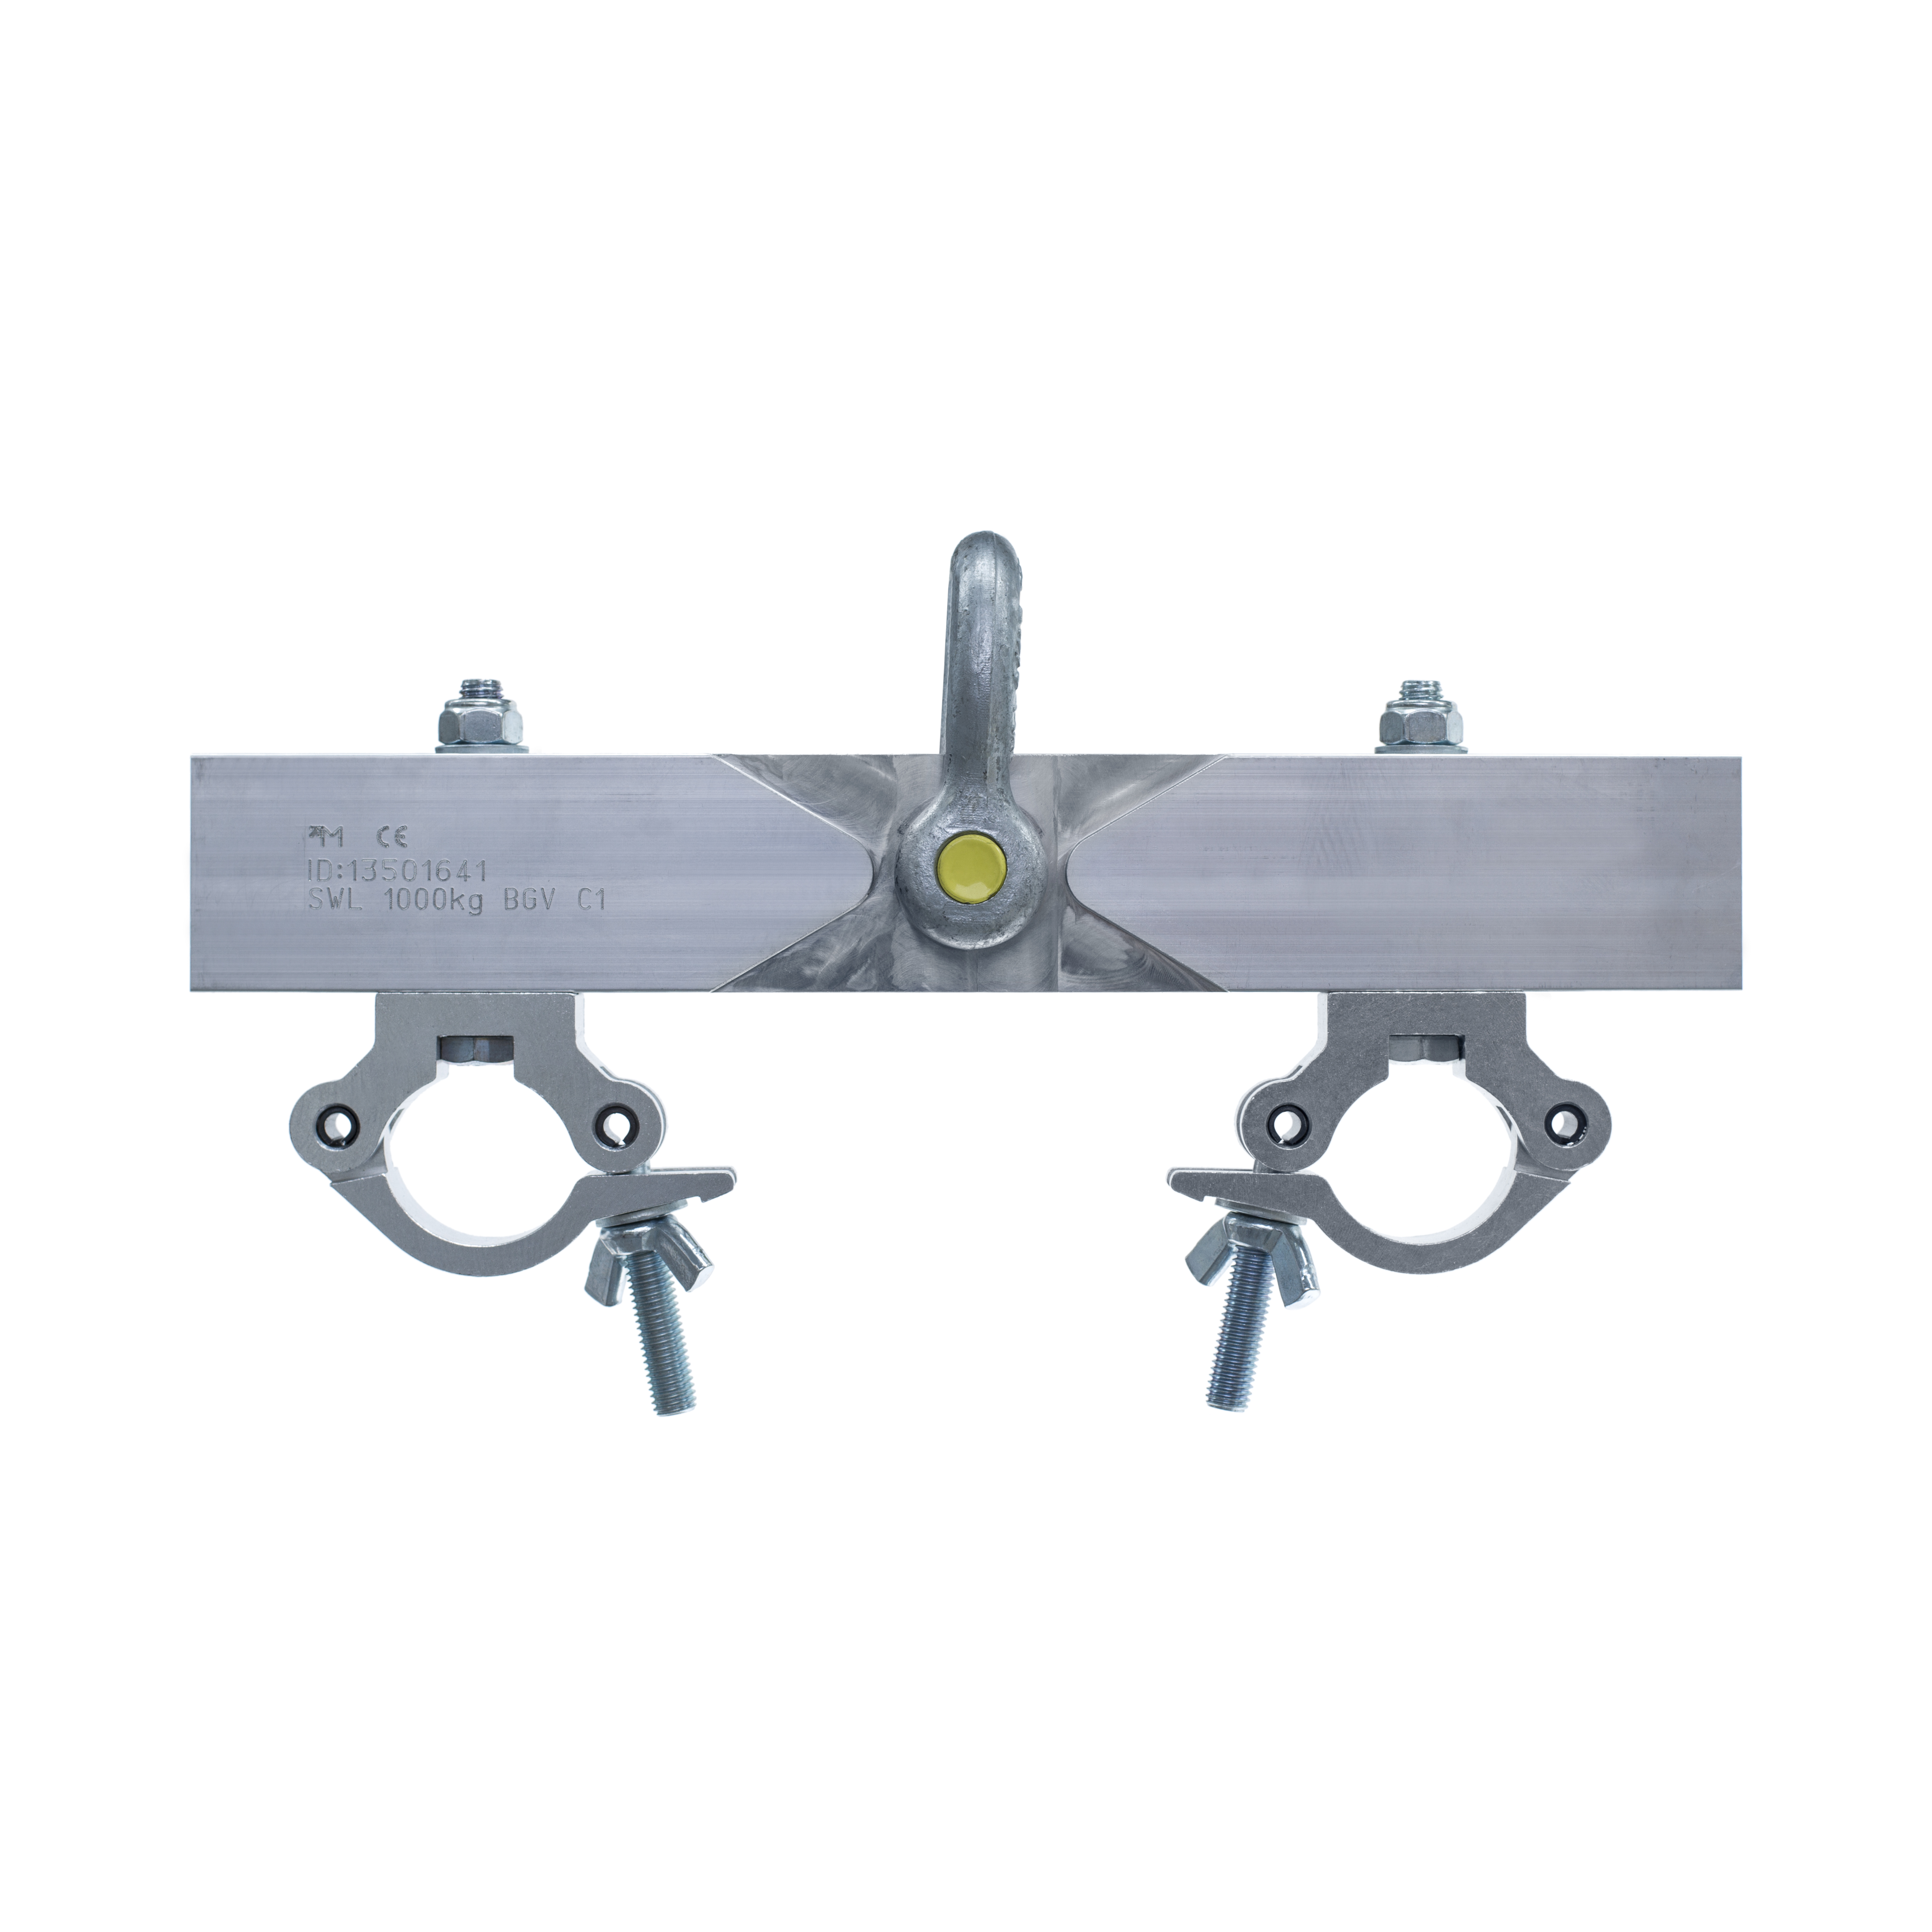 milos-adjustable-pick-up-beam-ceiling-support.jpg